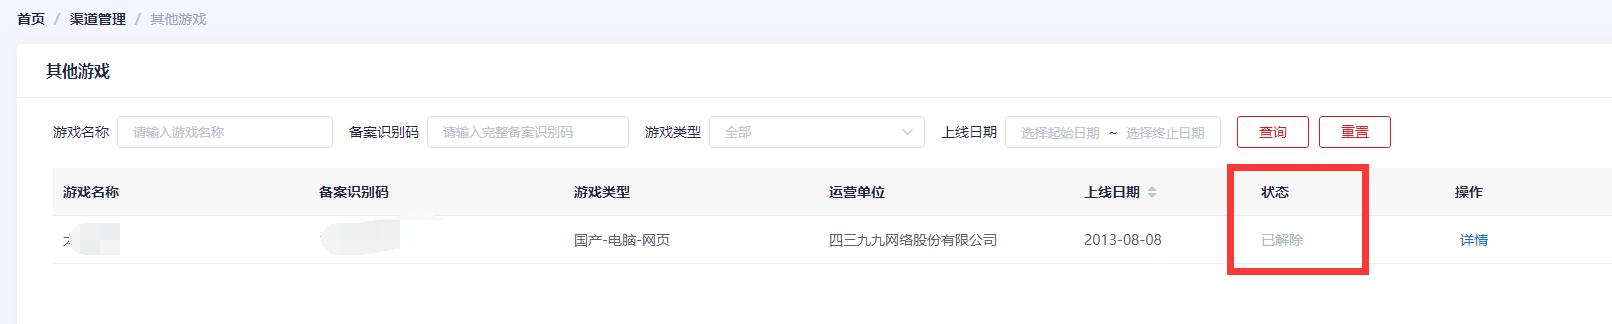 shimingzhirenzhengcaozuozhinan_16.png